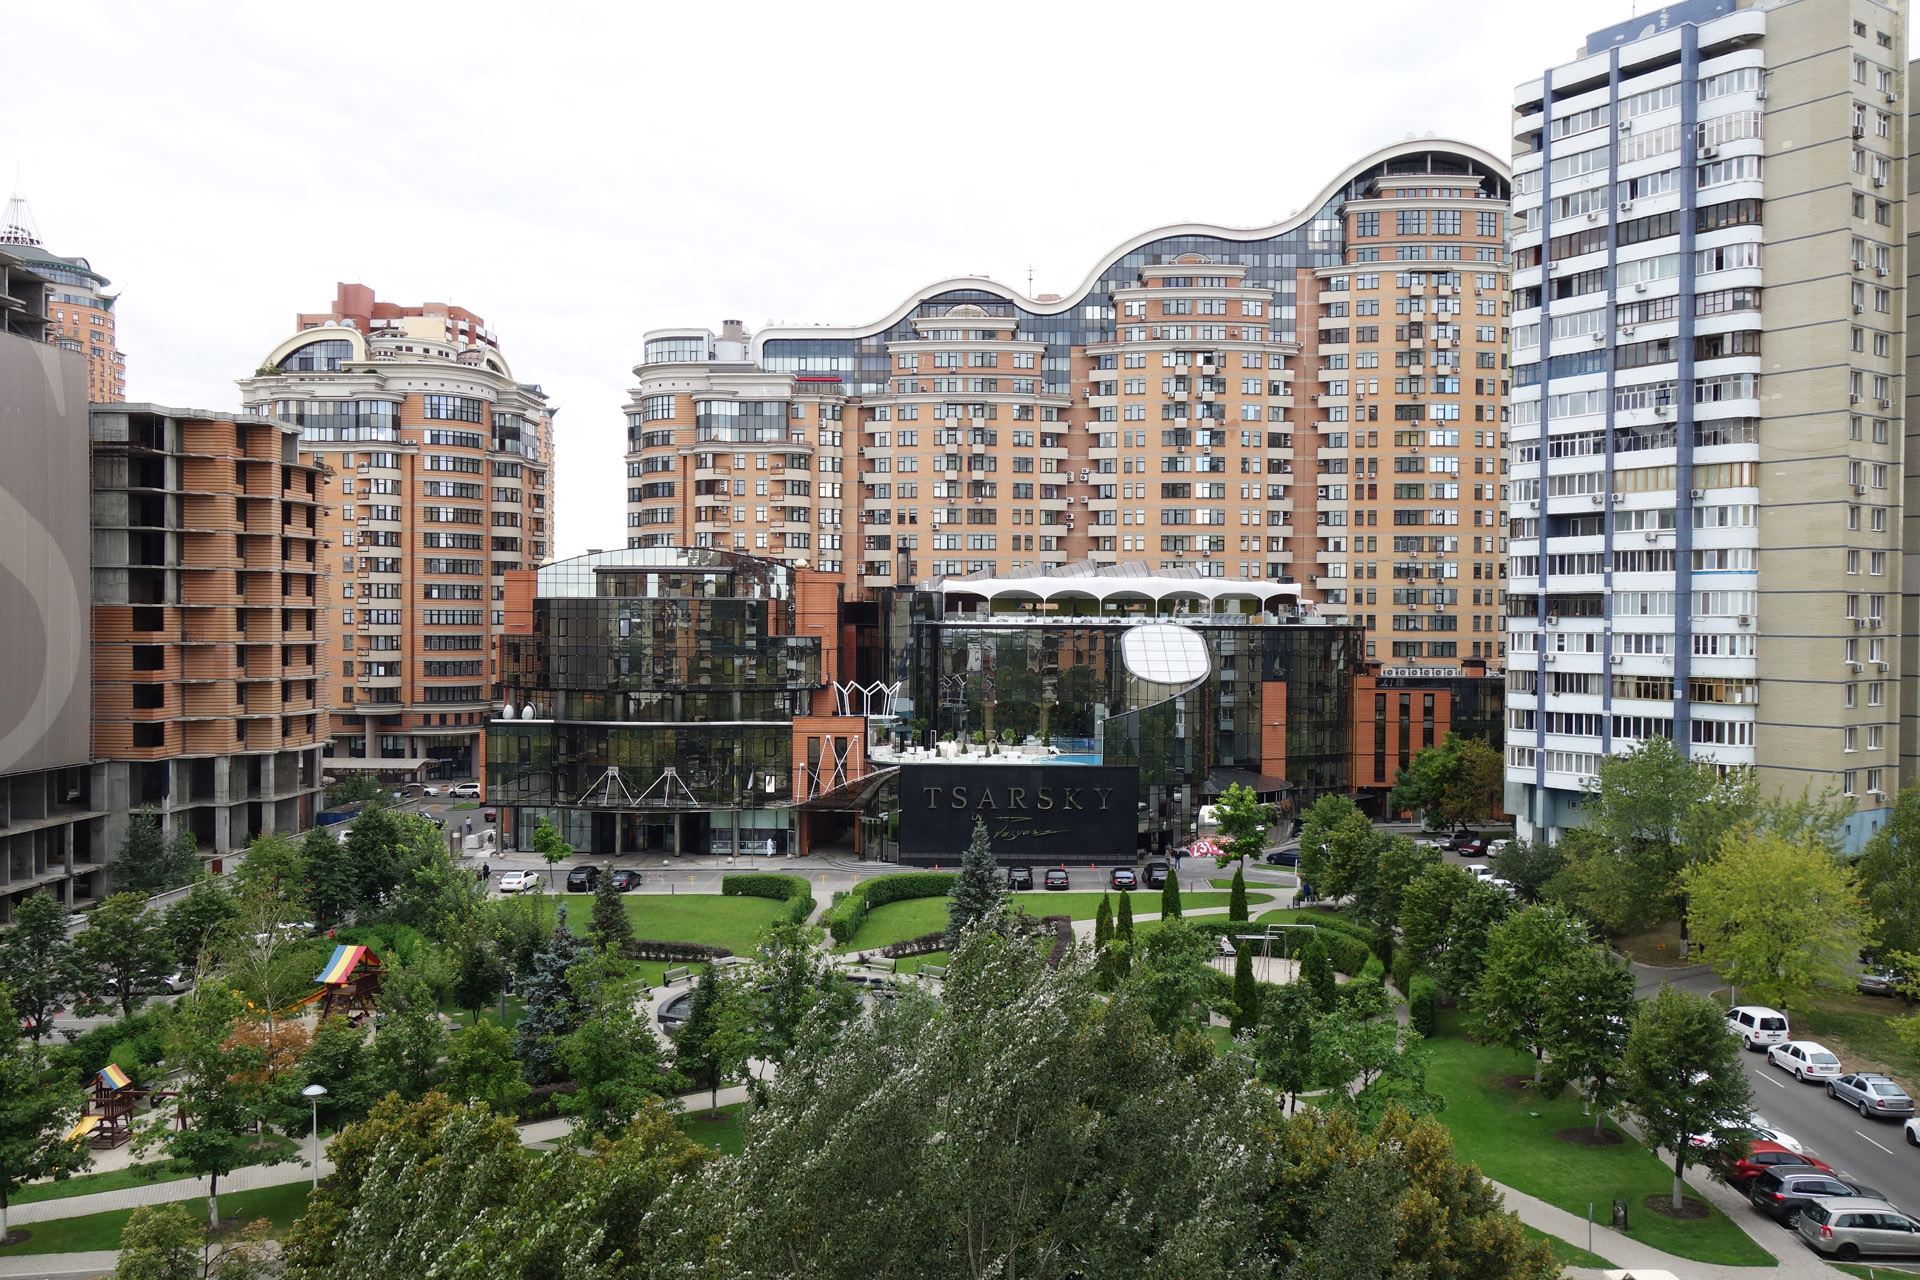 Аренда квартир в центре Киева: особенности и преимущества